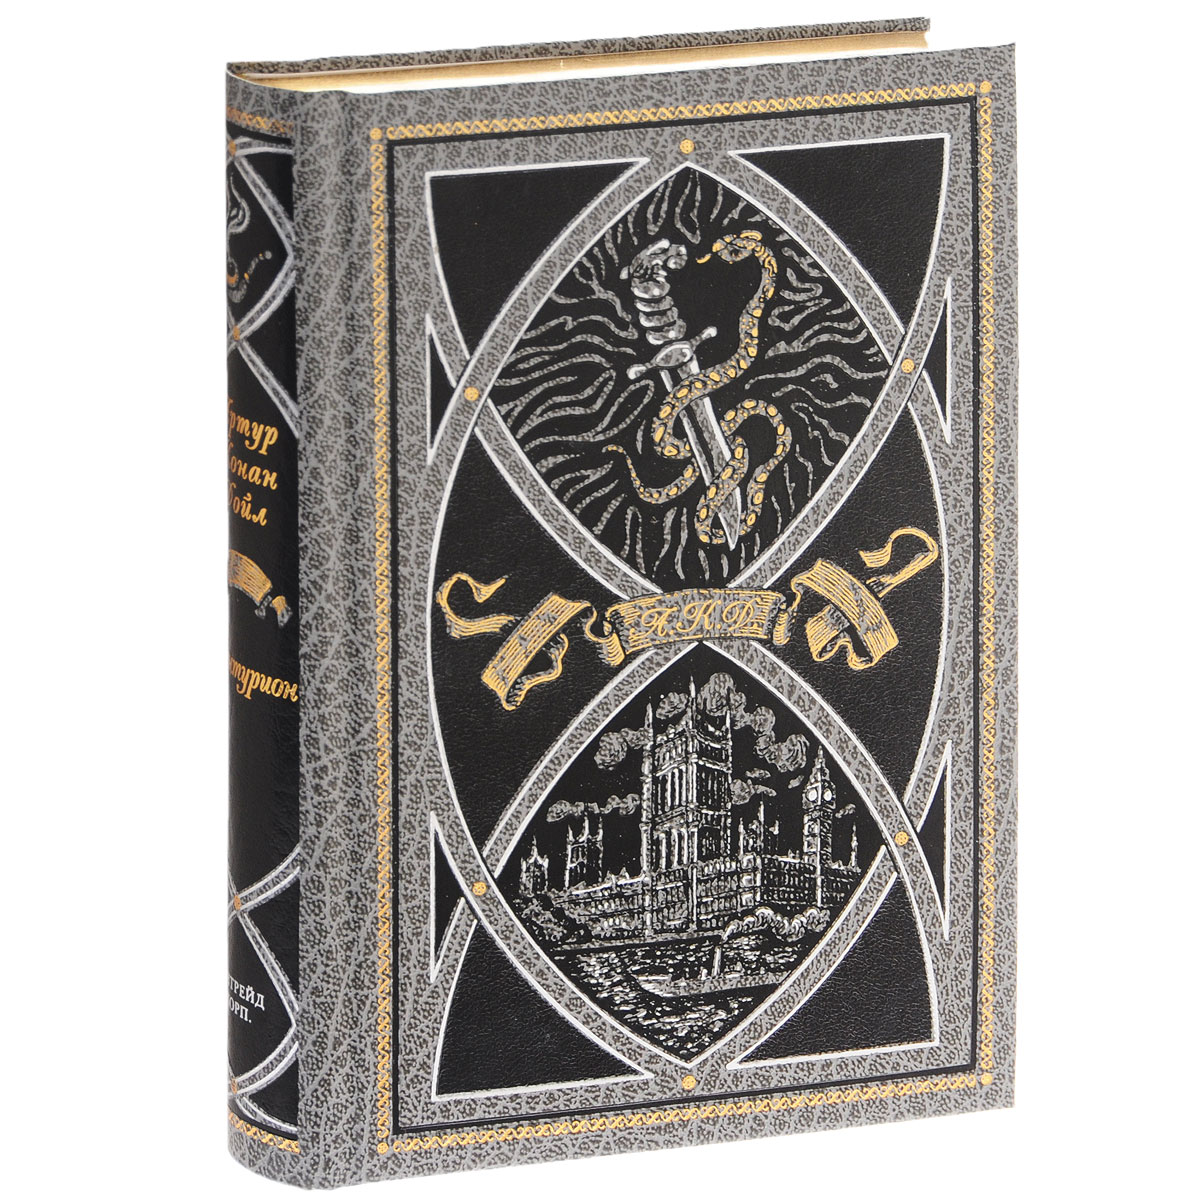 Артур Конан Дойл Артур Конан Дойл. Избранные сочинения. Центурион  (подарочное издание) артур конан дойл тайна клумбера